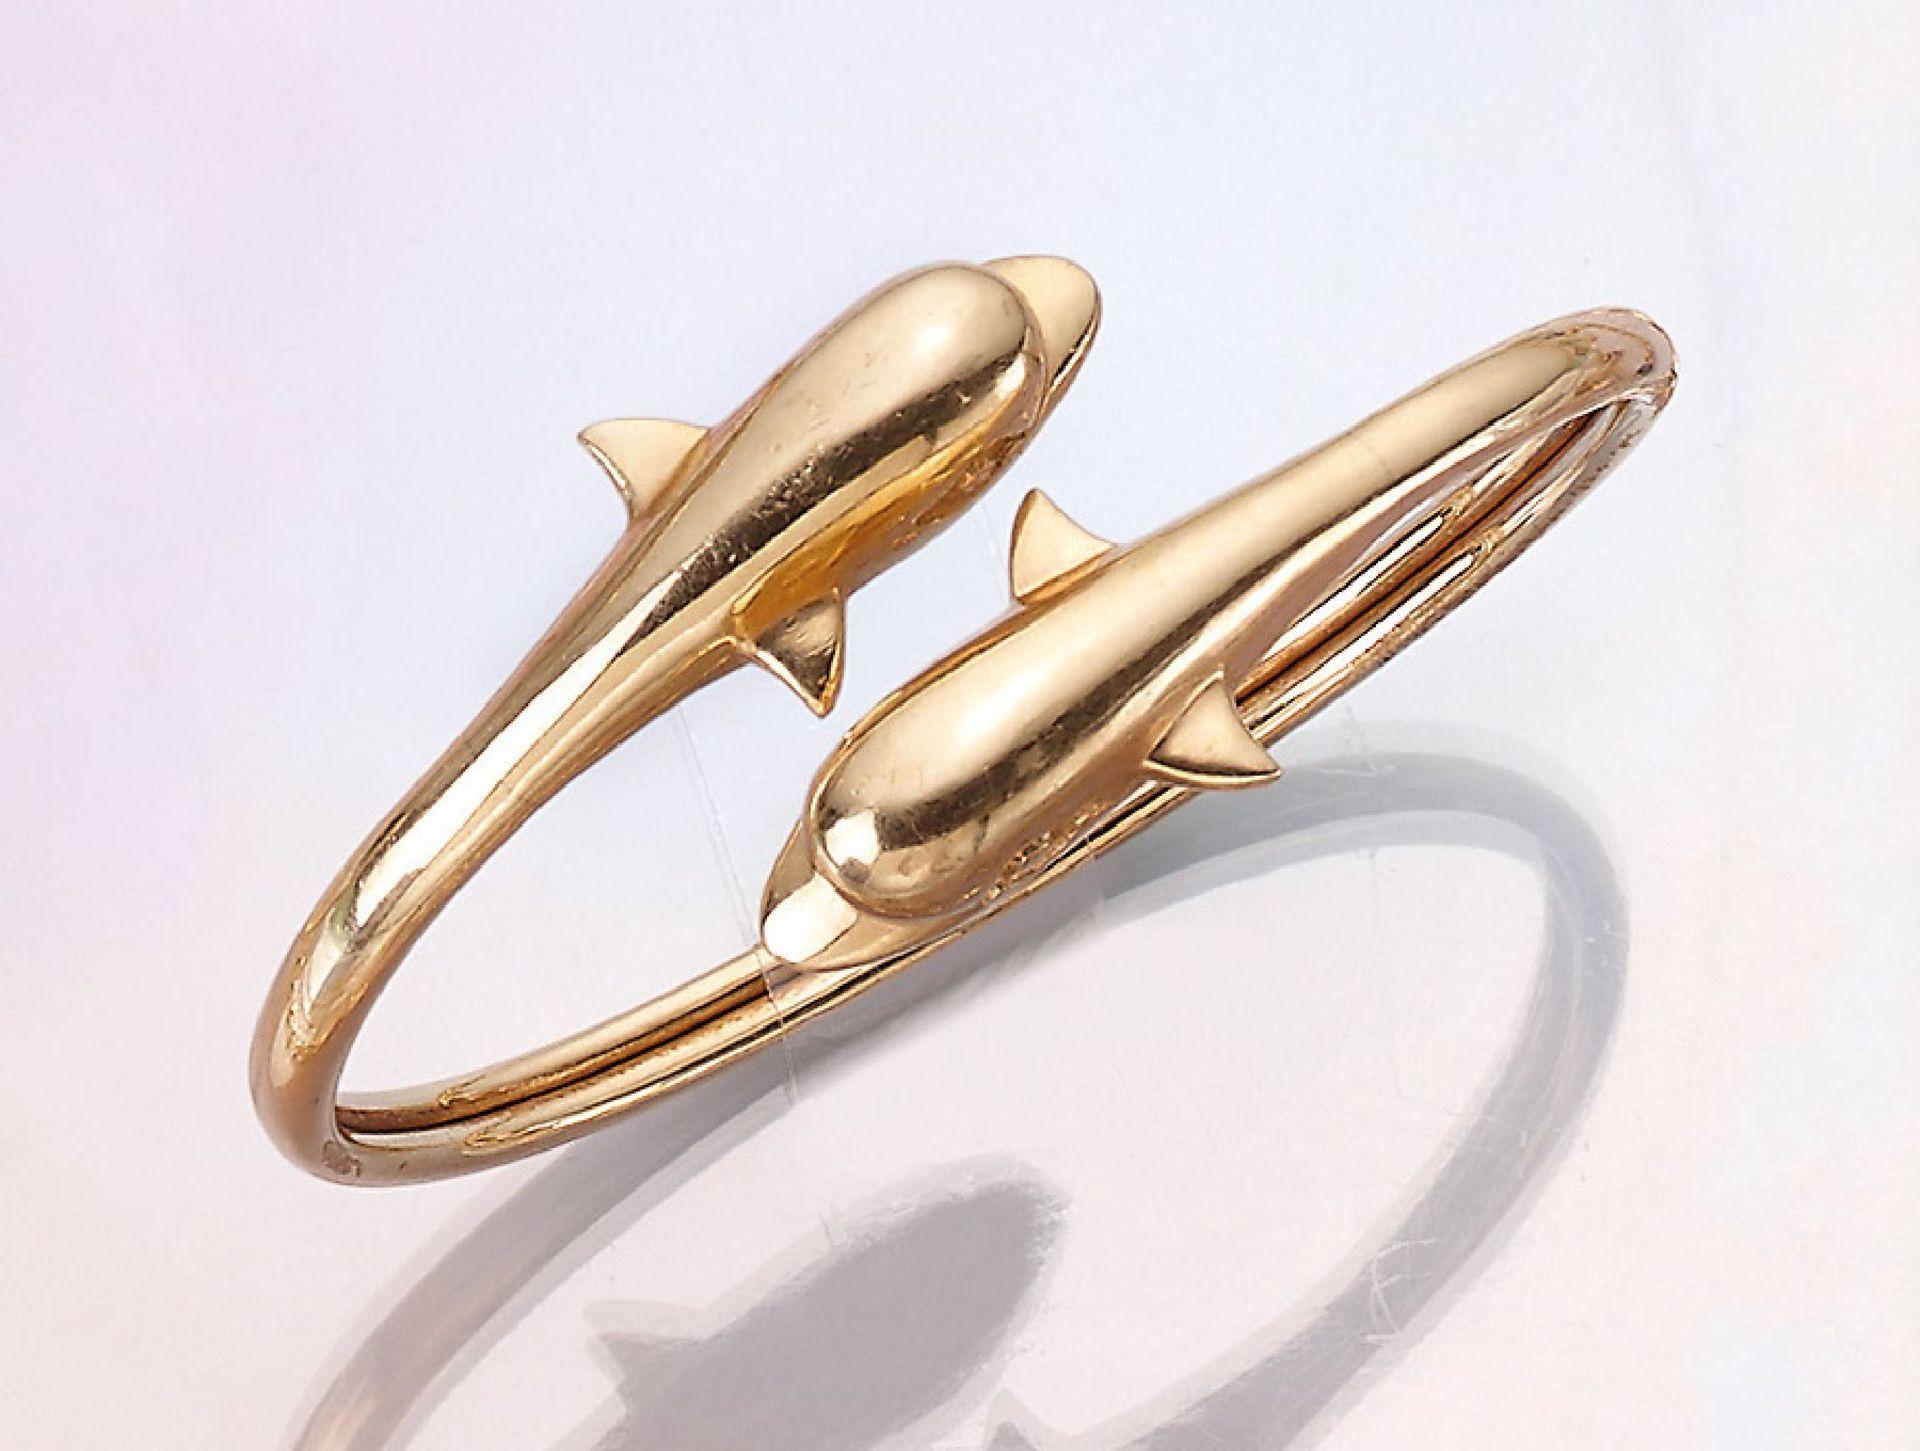 "Los 21514 - 14 kt Gold Armreif ""Delphine"", GG 585/000, ca. 5 x 6.5 cm, semi-flexibel, total ca. 20.8 g14 kt gold"